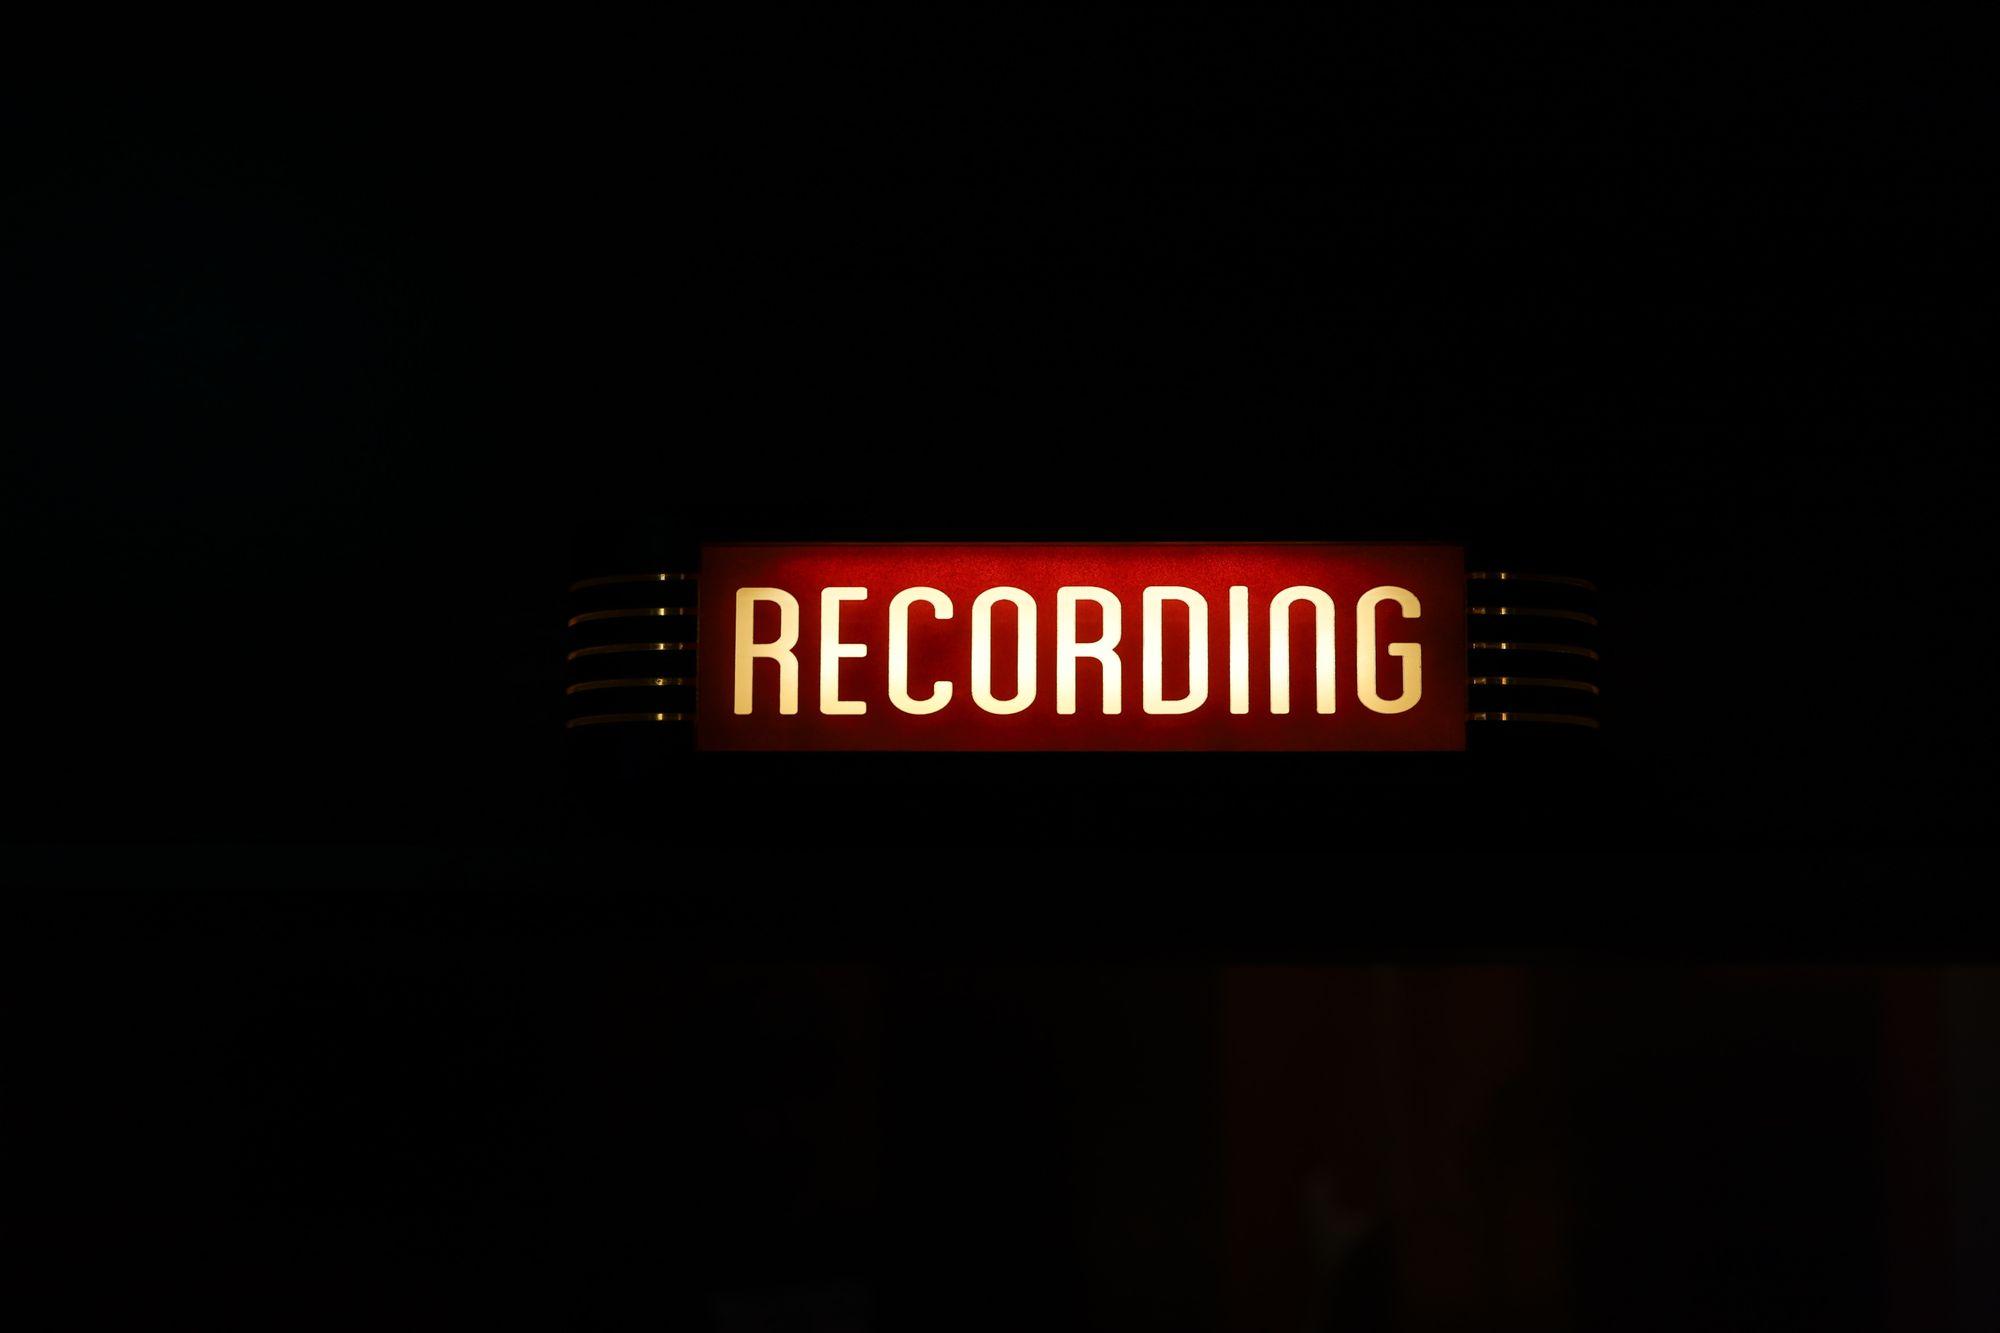 Recording light sign for studio in MTL, QC